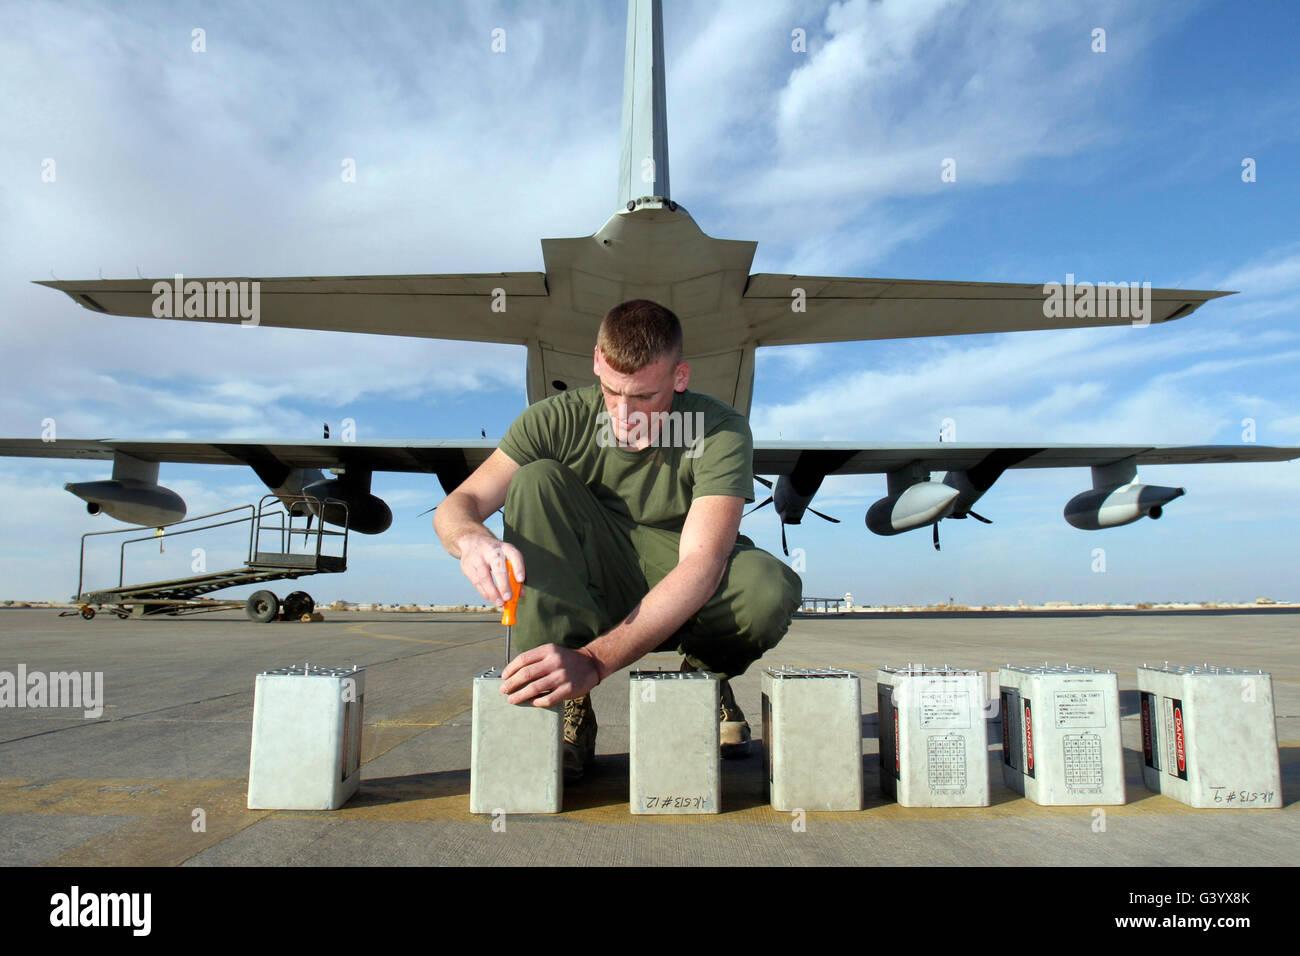 Un marine reemplaza las bengalas en Bengala dispensadores desde un KC-130J Hercules. Imagen De Stock